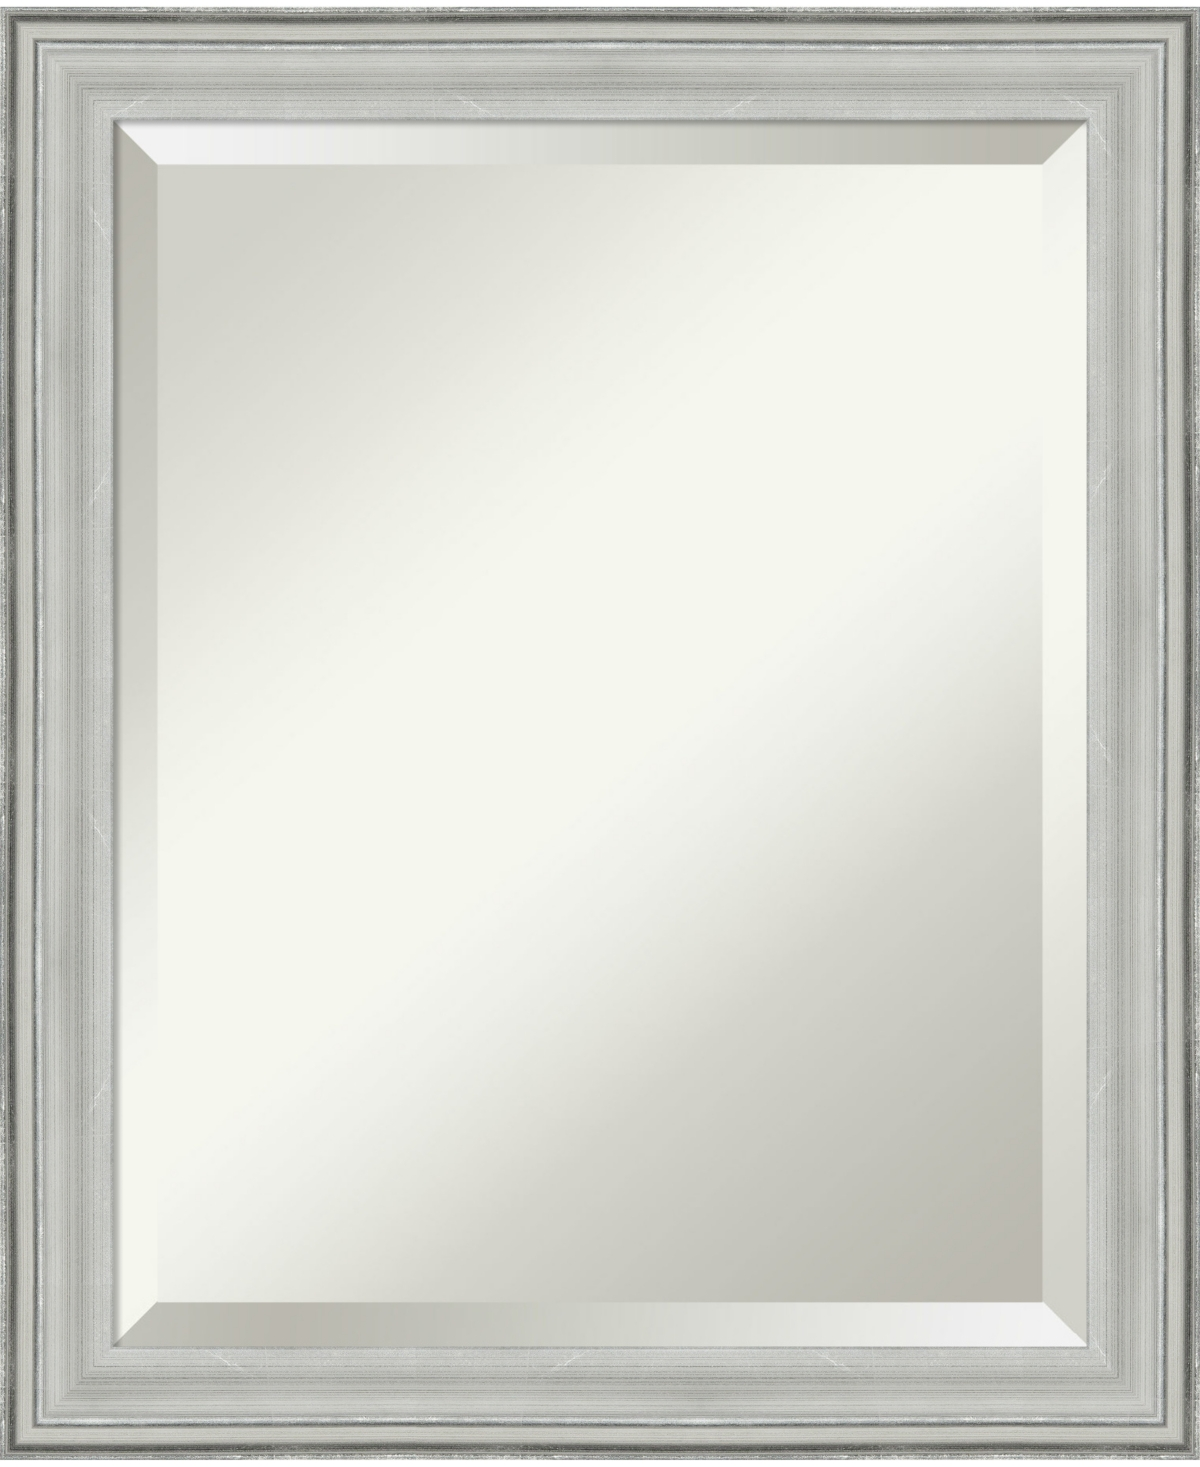 Amanti Art Bel Volto 19x23 Bathroom Mirror